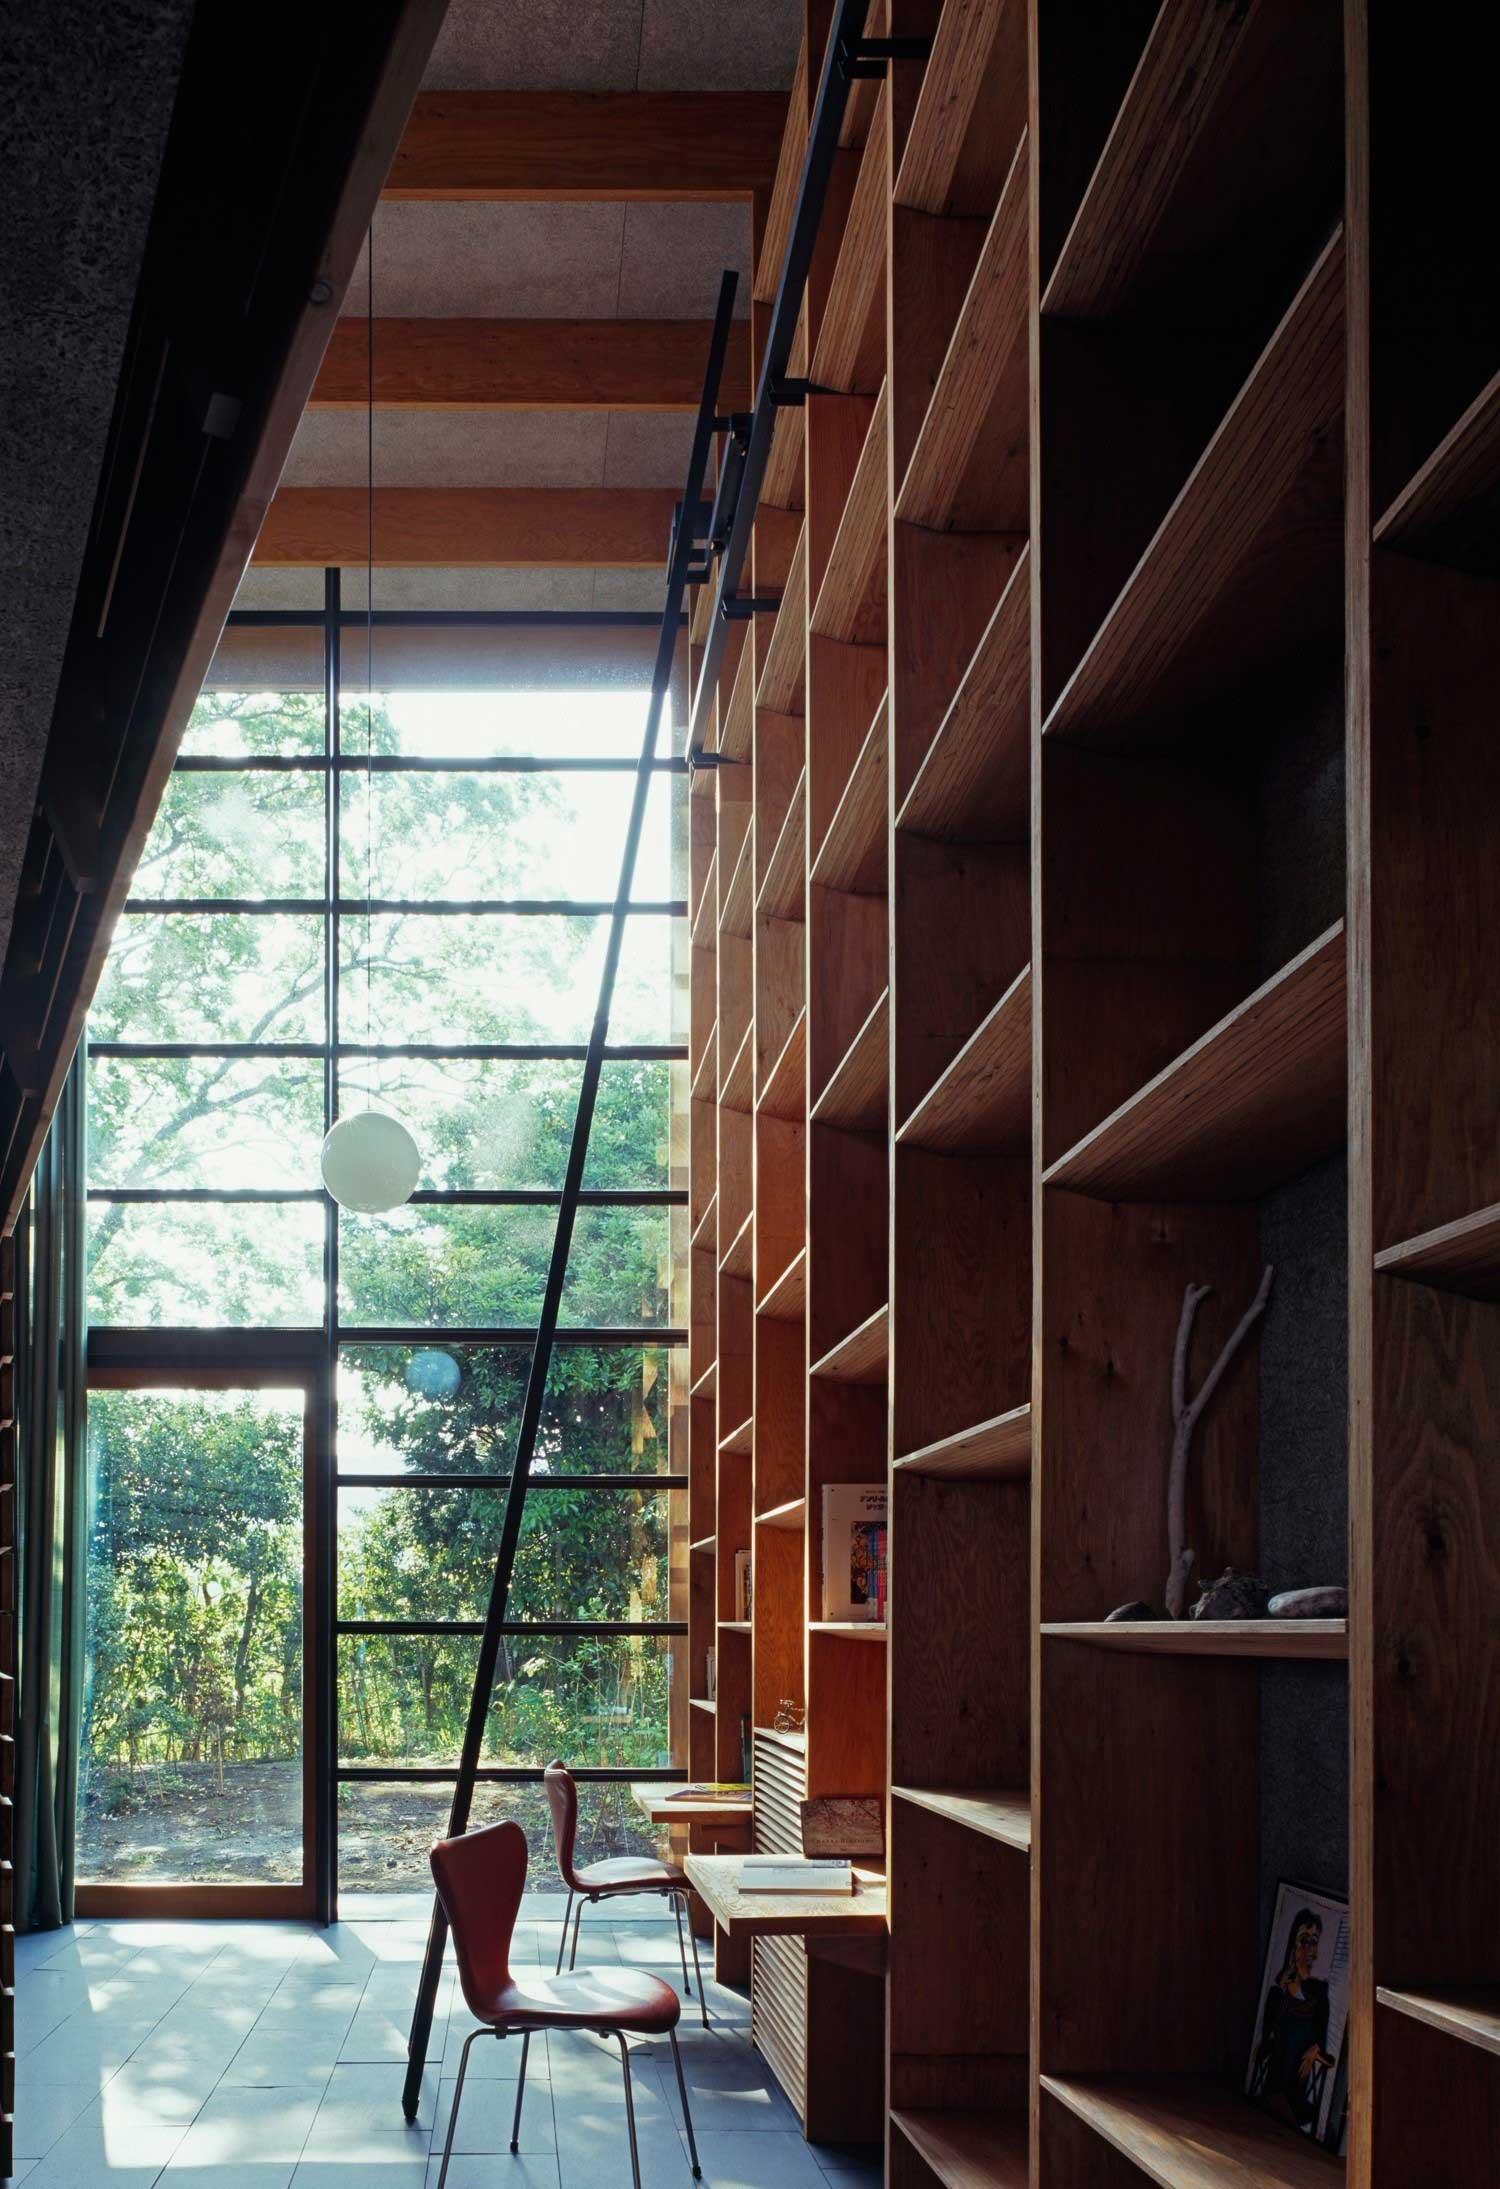 Shore House By Mount Fuji Architects Studio | Yellowtrace